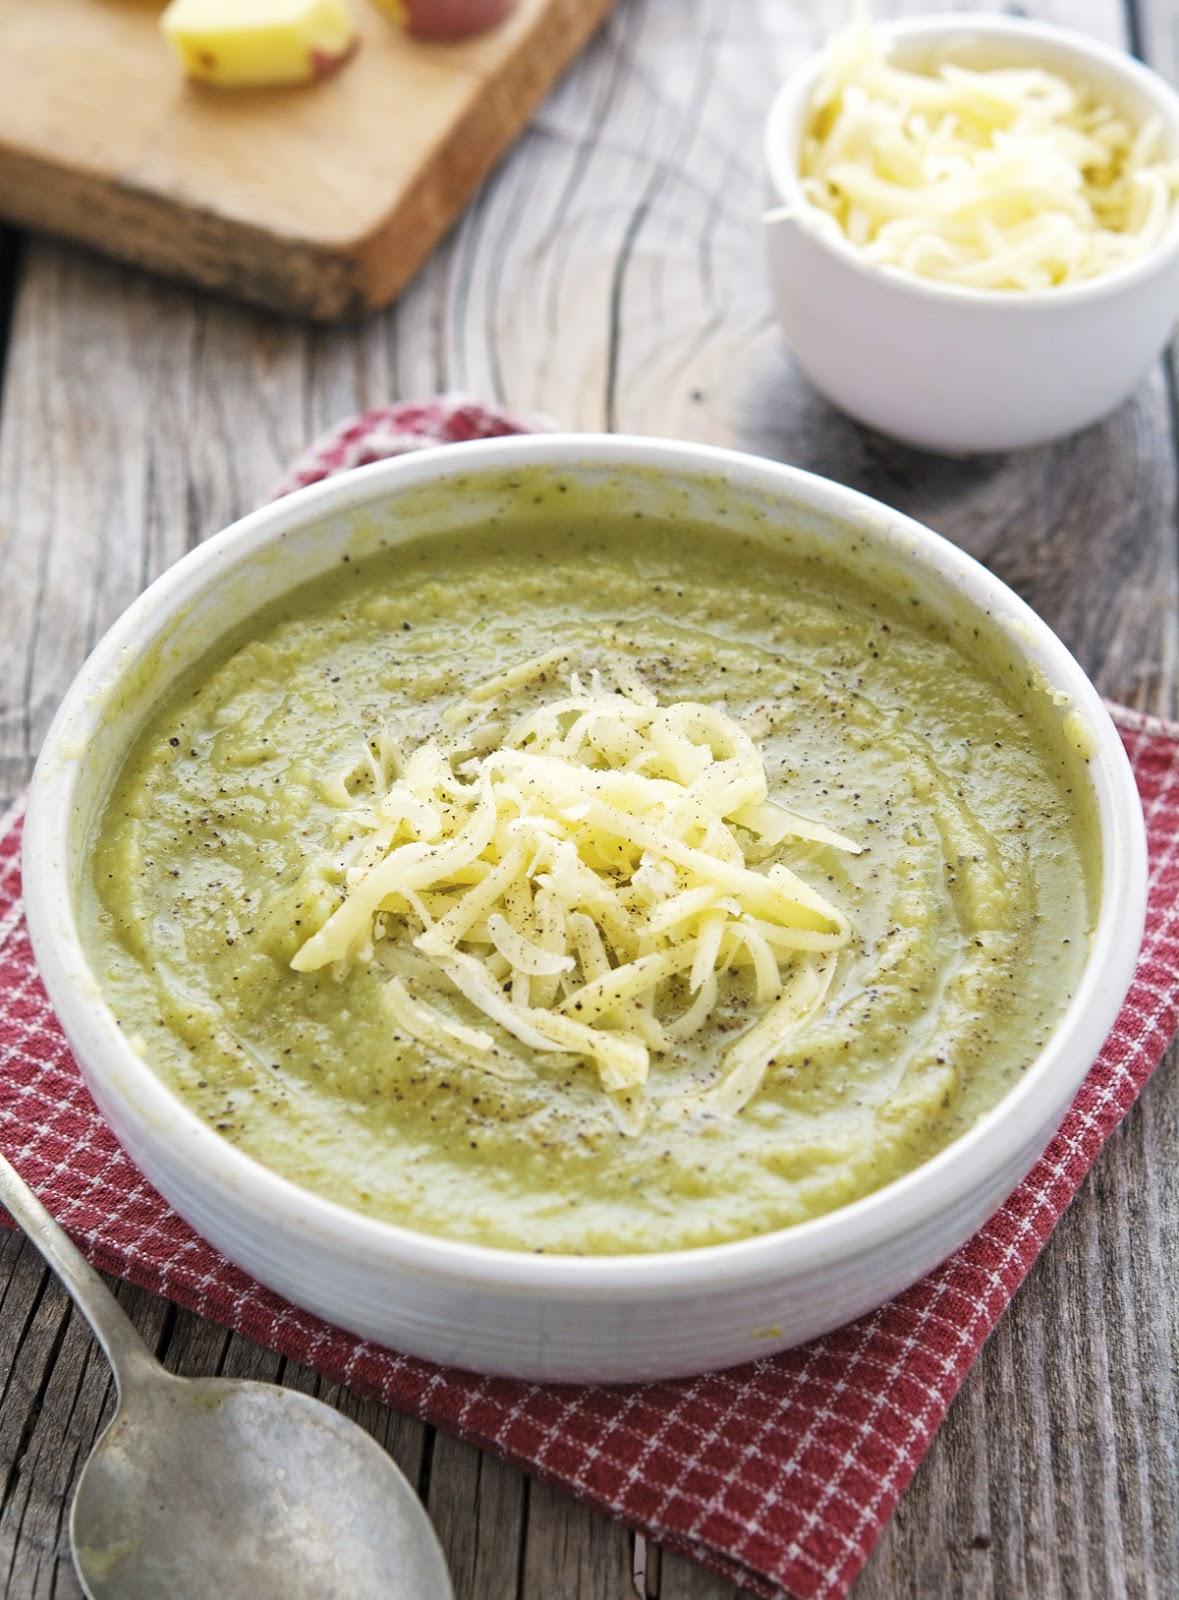 Broccoli and Cheese Mashed Potatoes